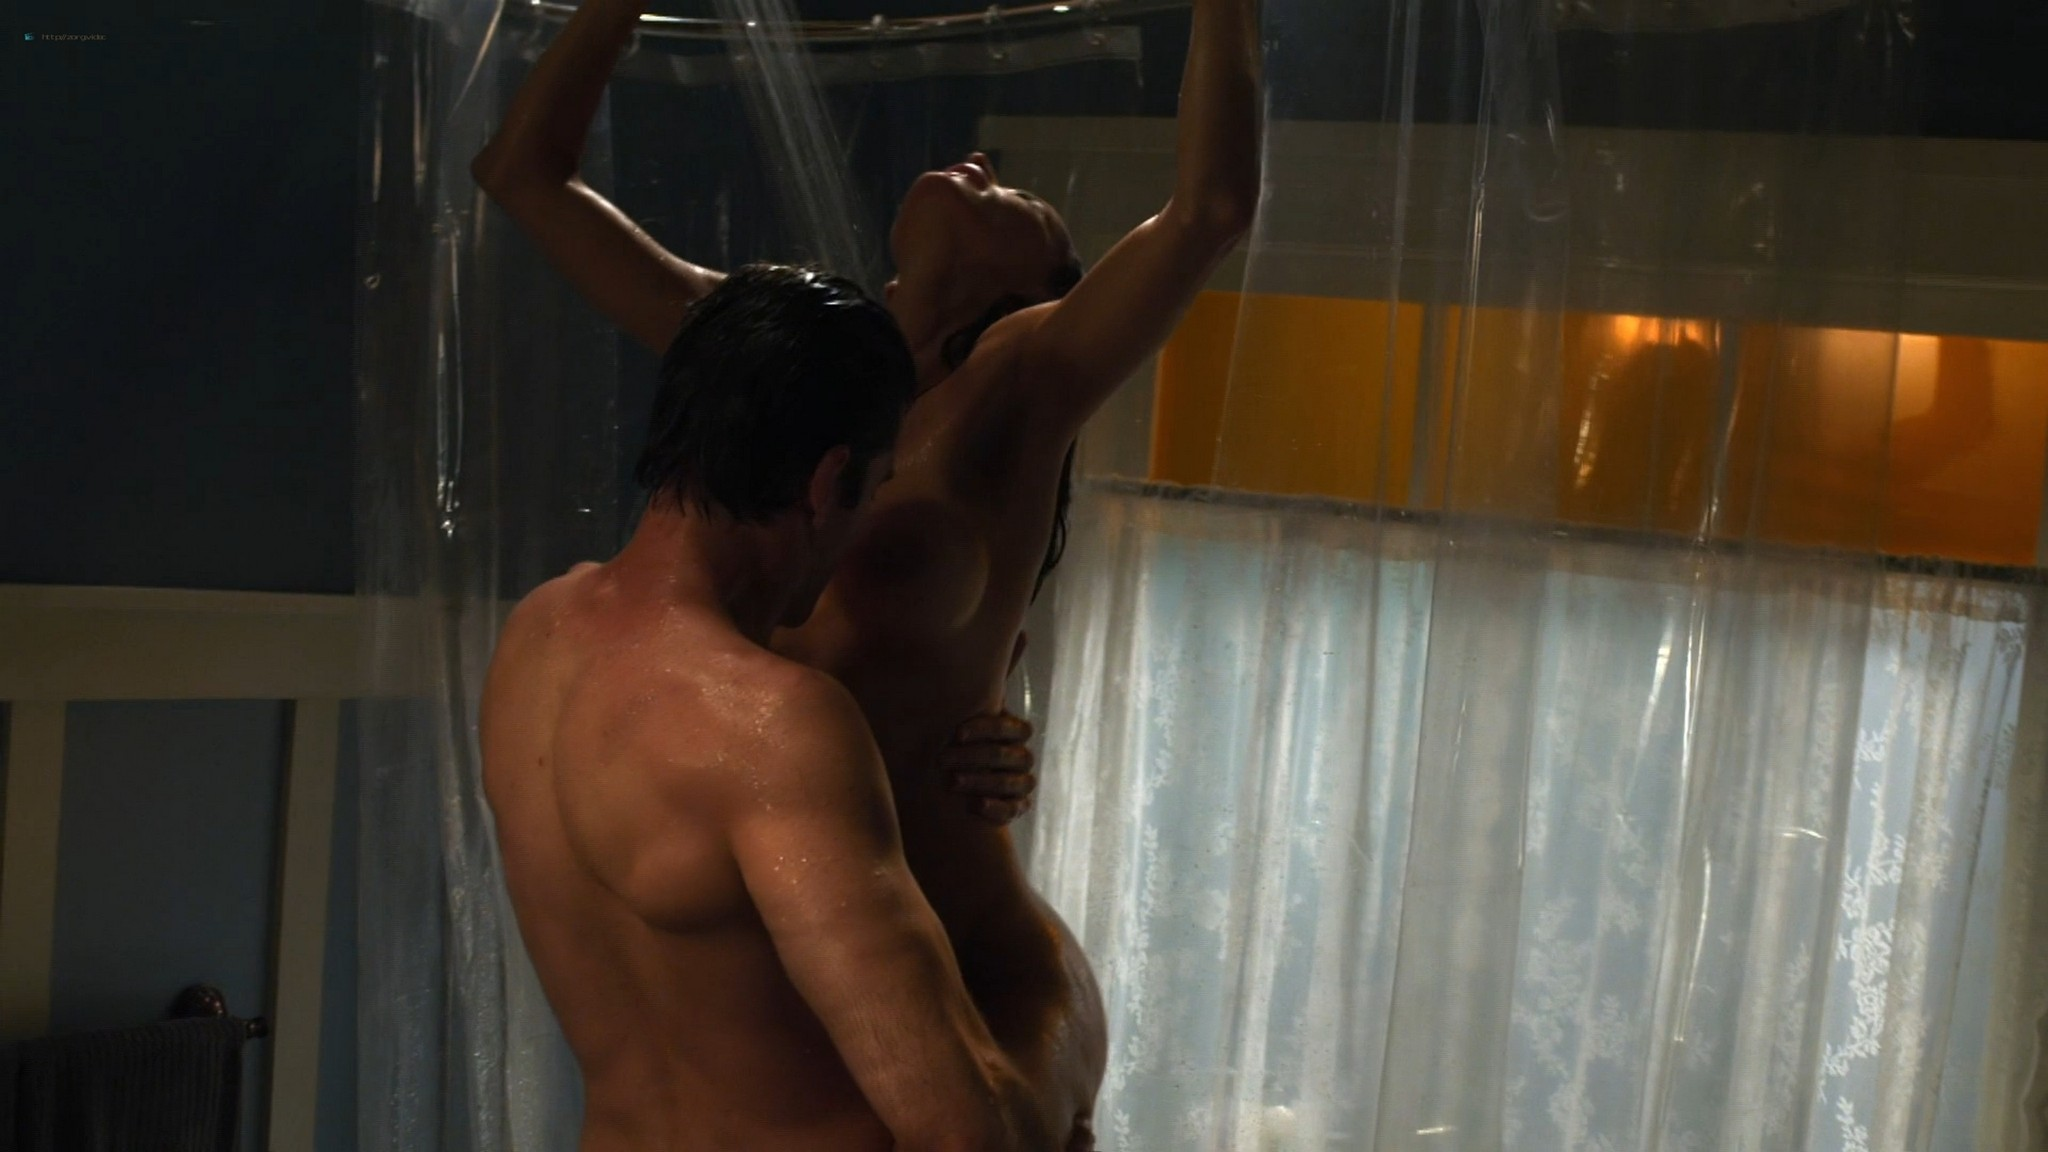 Ana Alexander nude sex Antonia Raftu sexy - Chemistry (2011) s1e10 HD 1080p (8)